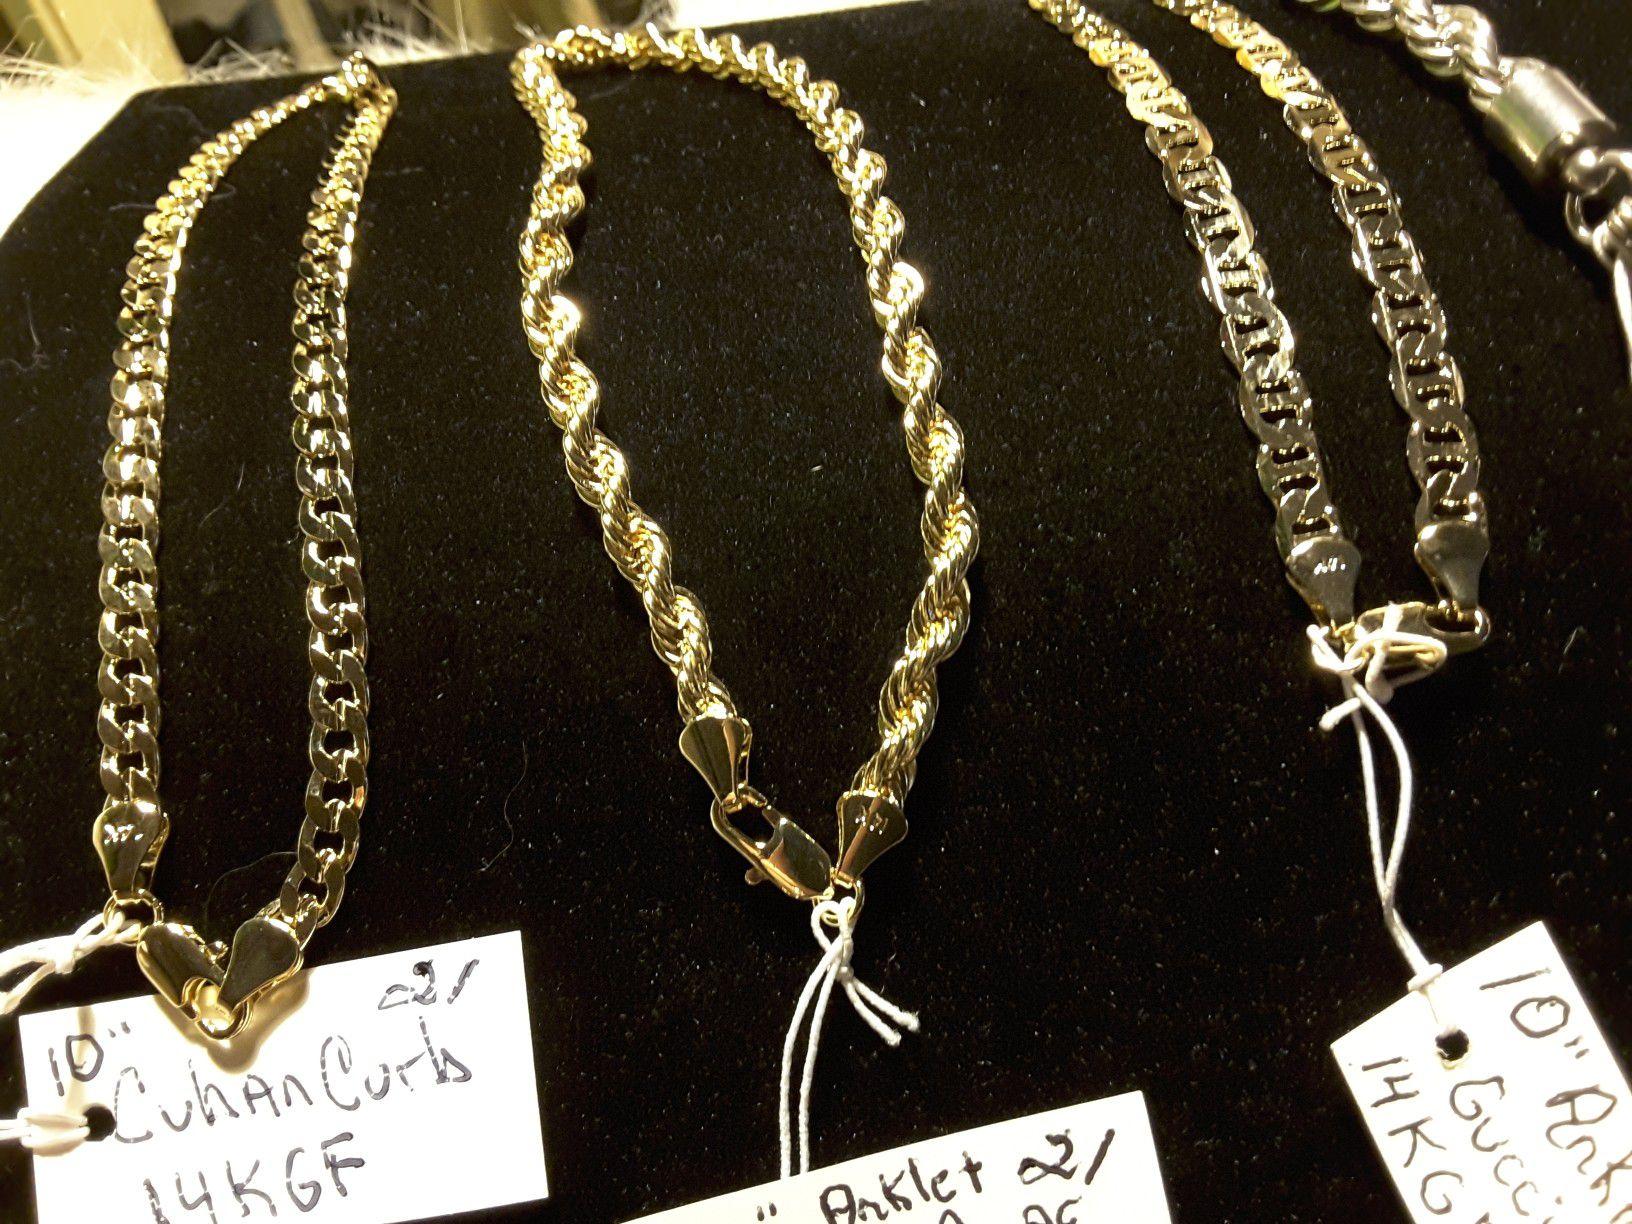 "10"" Bracletes/Anklets gold & StainlessSteel 20$-21$"